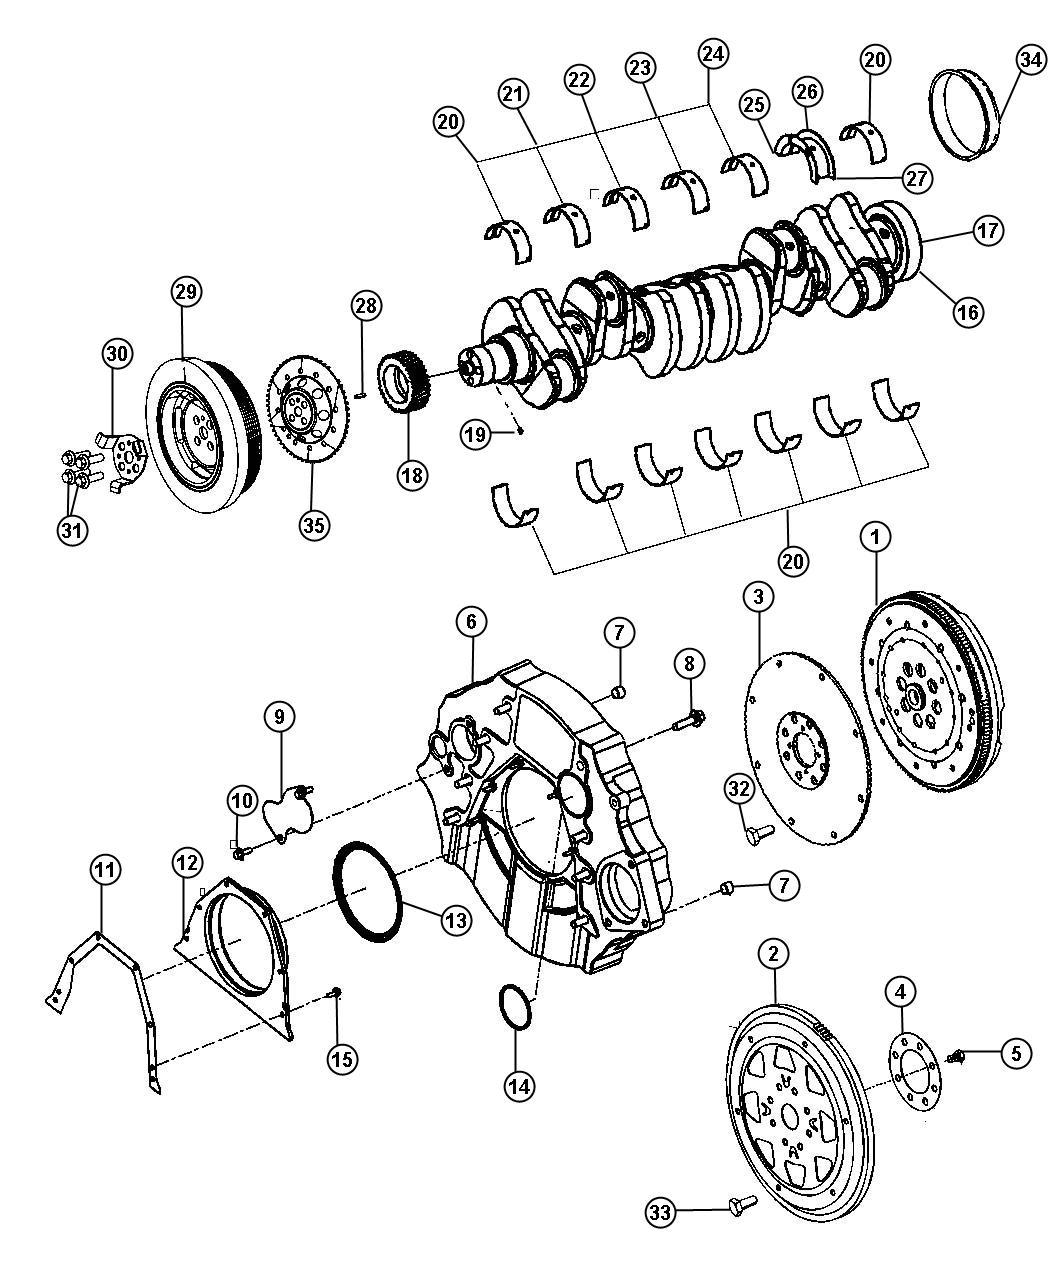 Dodge Ram Ring Tone Federal Emissions Export